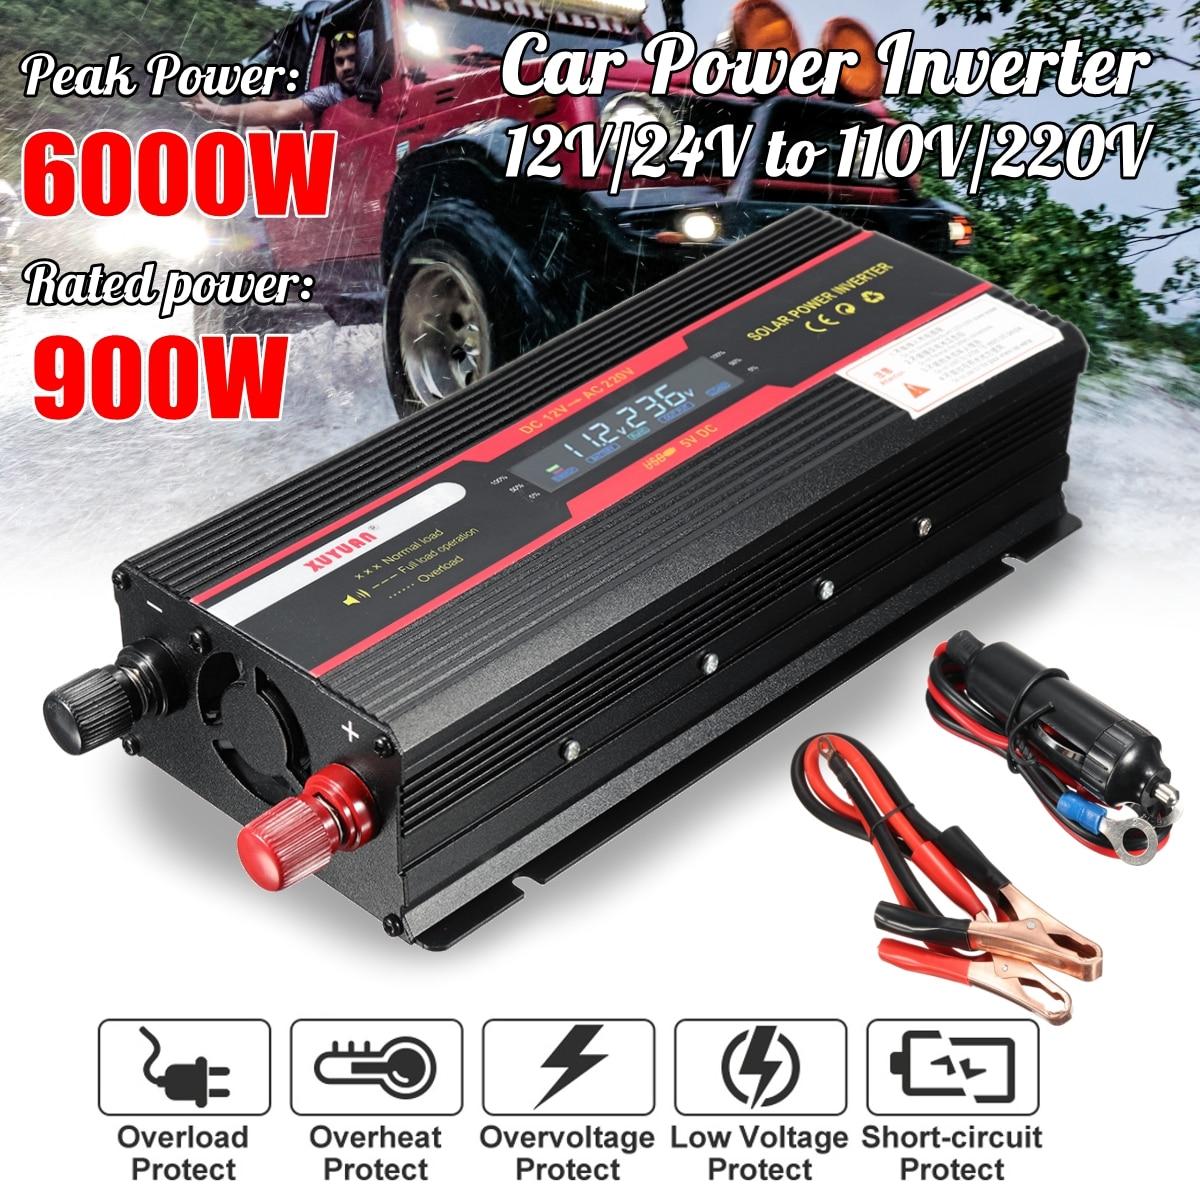 Car Inverter 12V 220V 6000W P eak Power Inverter Voltage Convertor Transformer DC 12V/24V To AC 220V/110V Solar Inversor 1pcs lot sh b17 50w 220v to 110v 110v to 220v